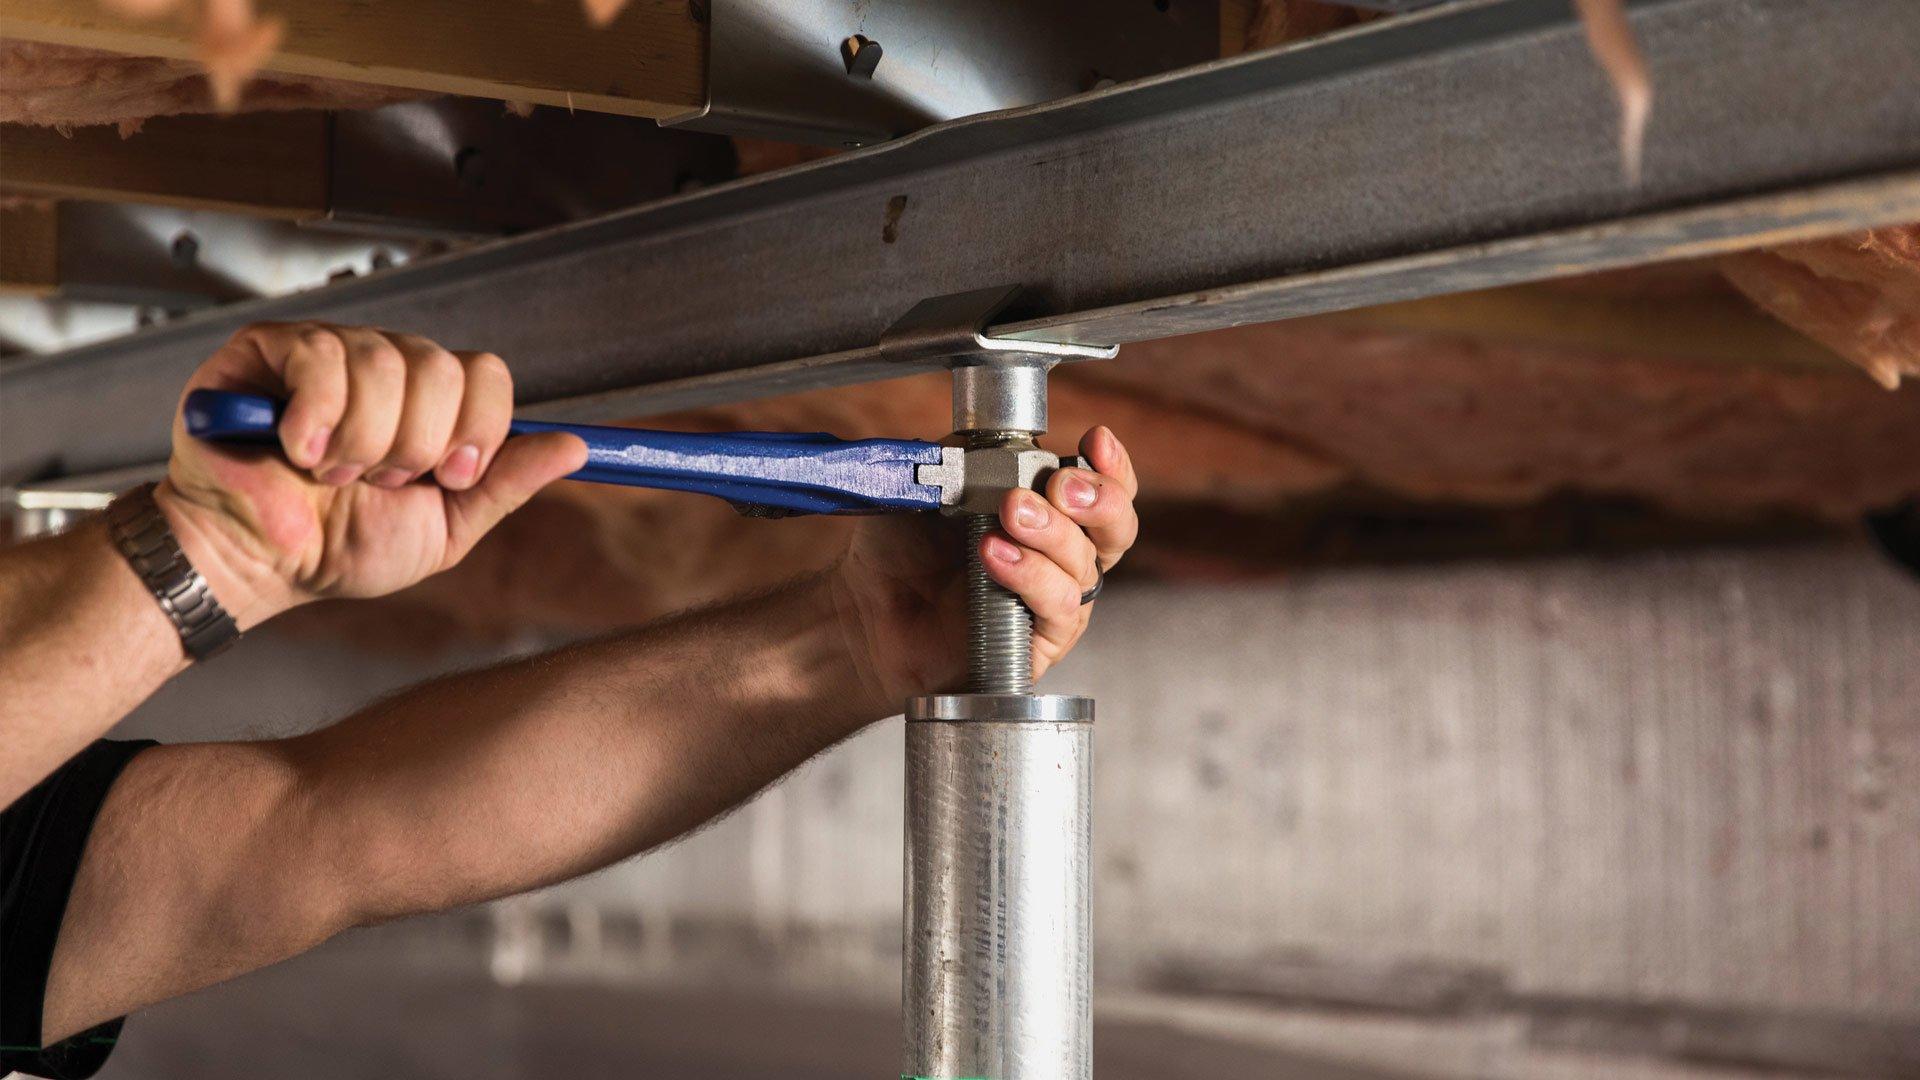 Technician using tool to tighten bracket